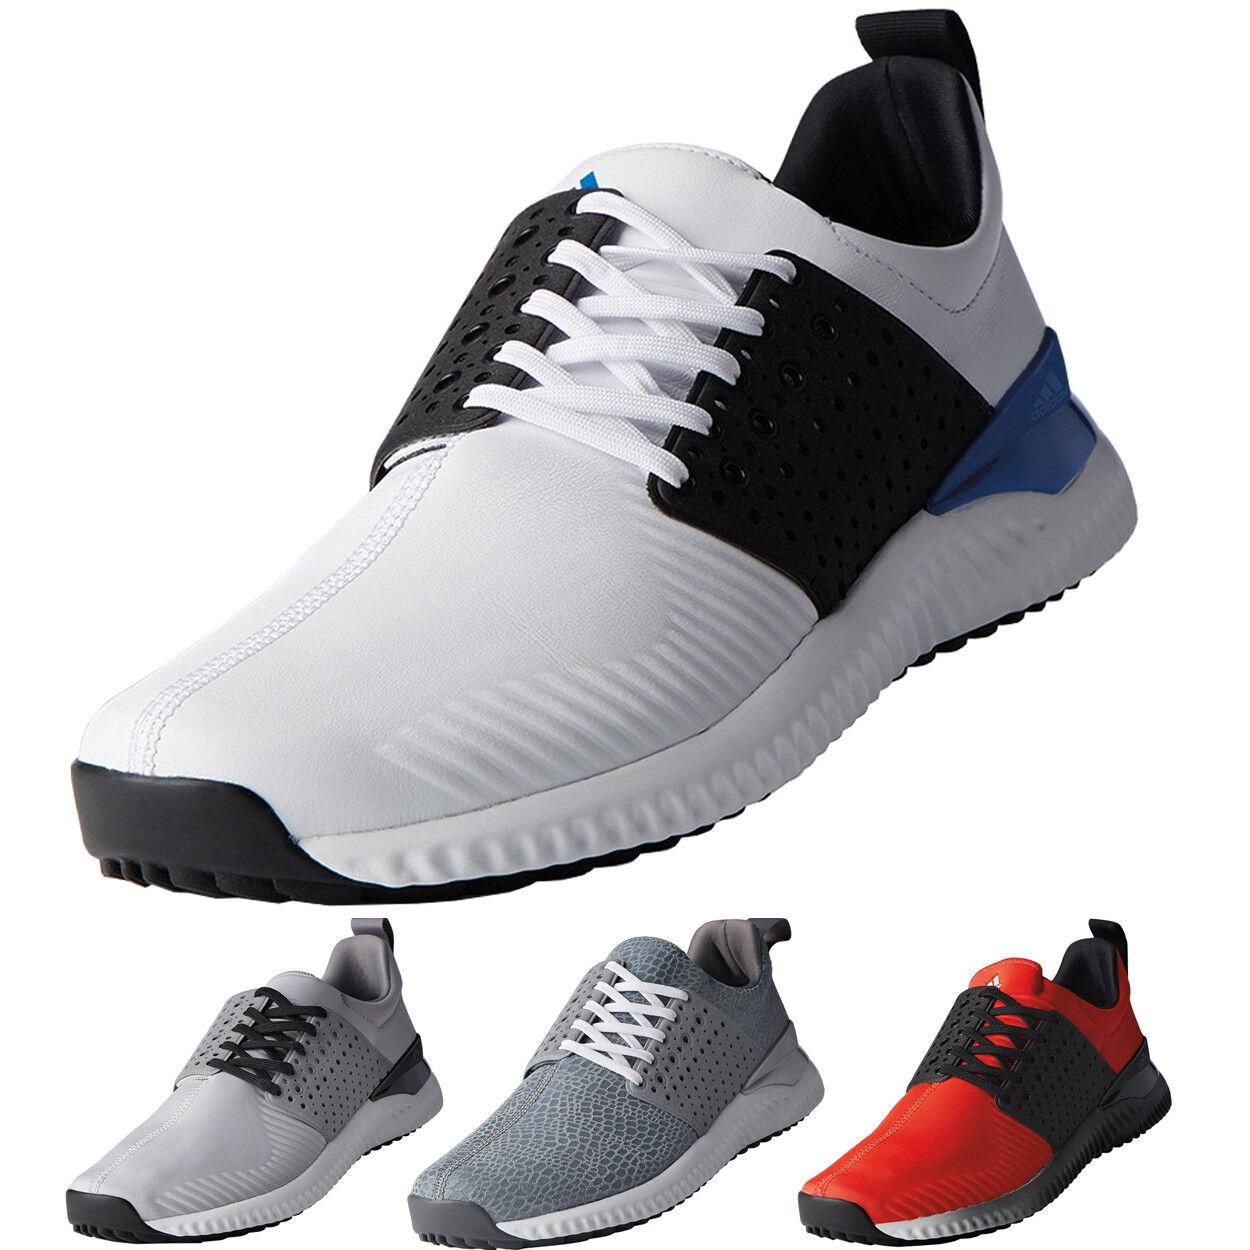 Vigilancia Petrificar El diseño  Adidas Men's Adicross Bounce Golf Shoes, New for sale online